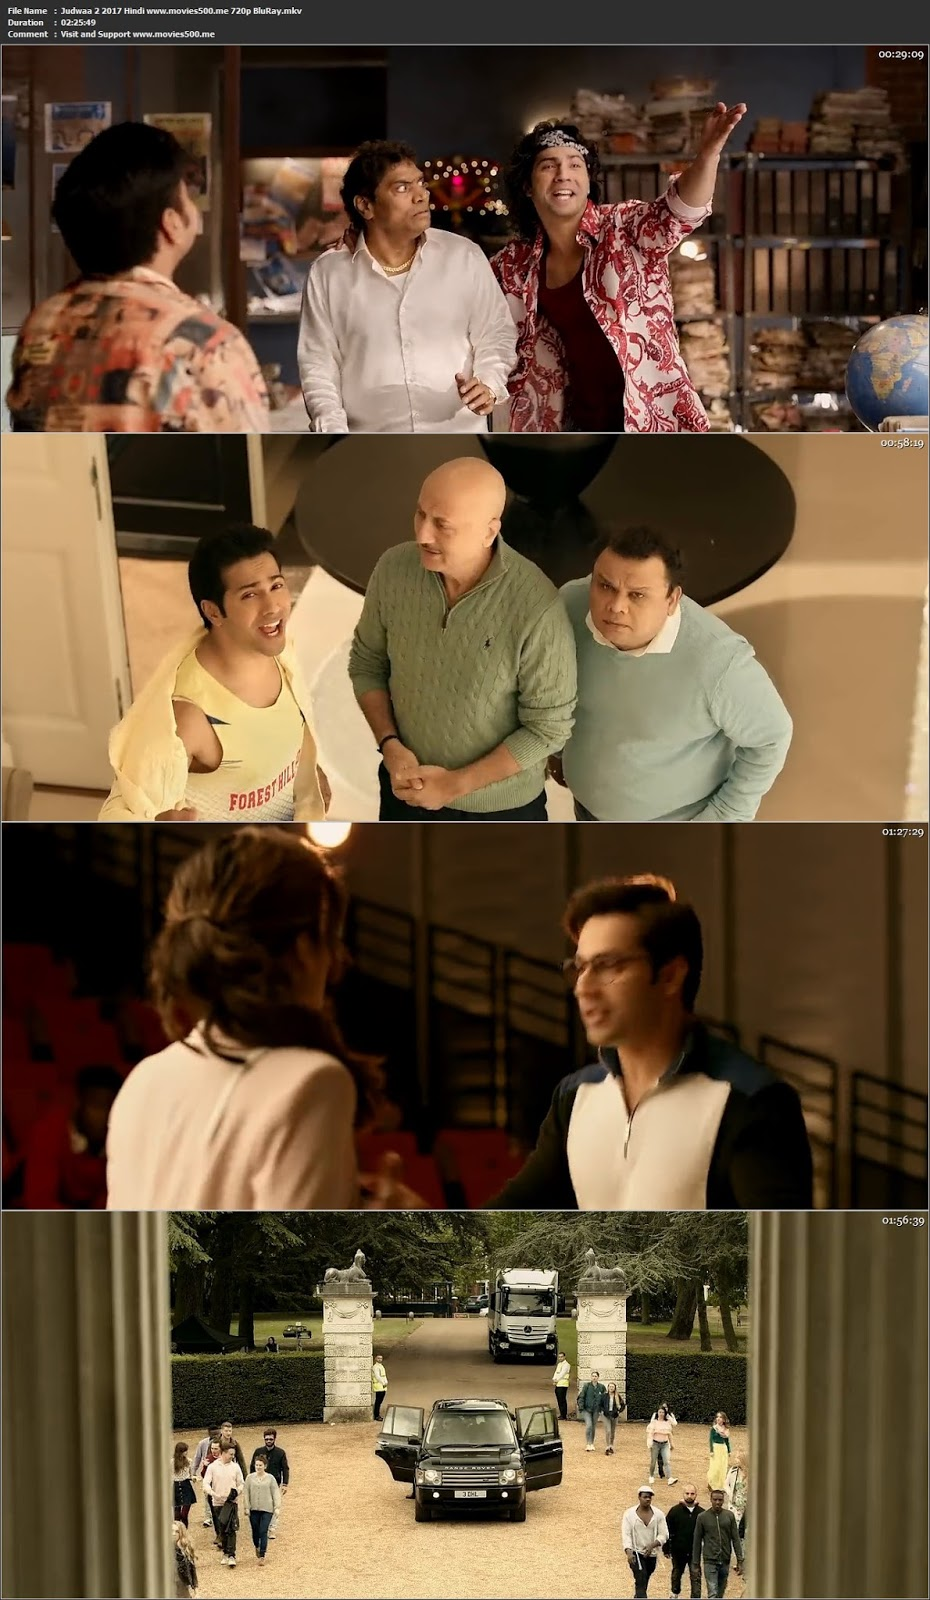 Judwaa 2 2017 Hindi Full Movie BluRay 720p 1GB at sandrastclairphotography.com